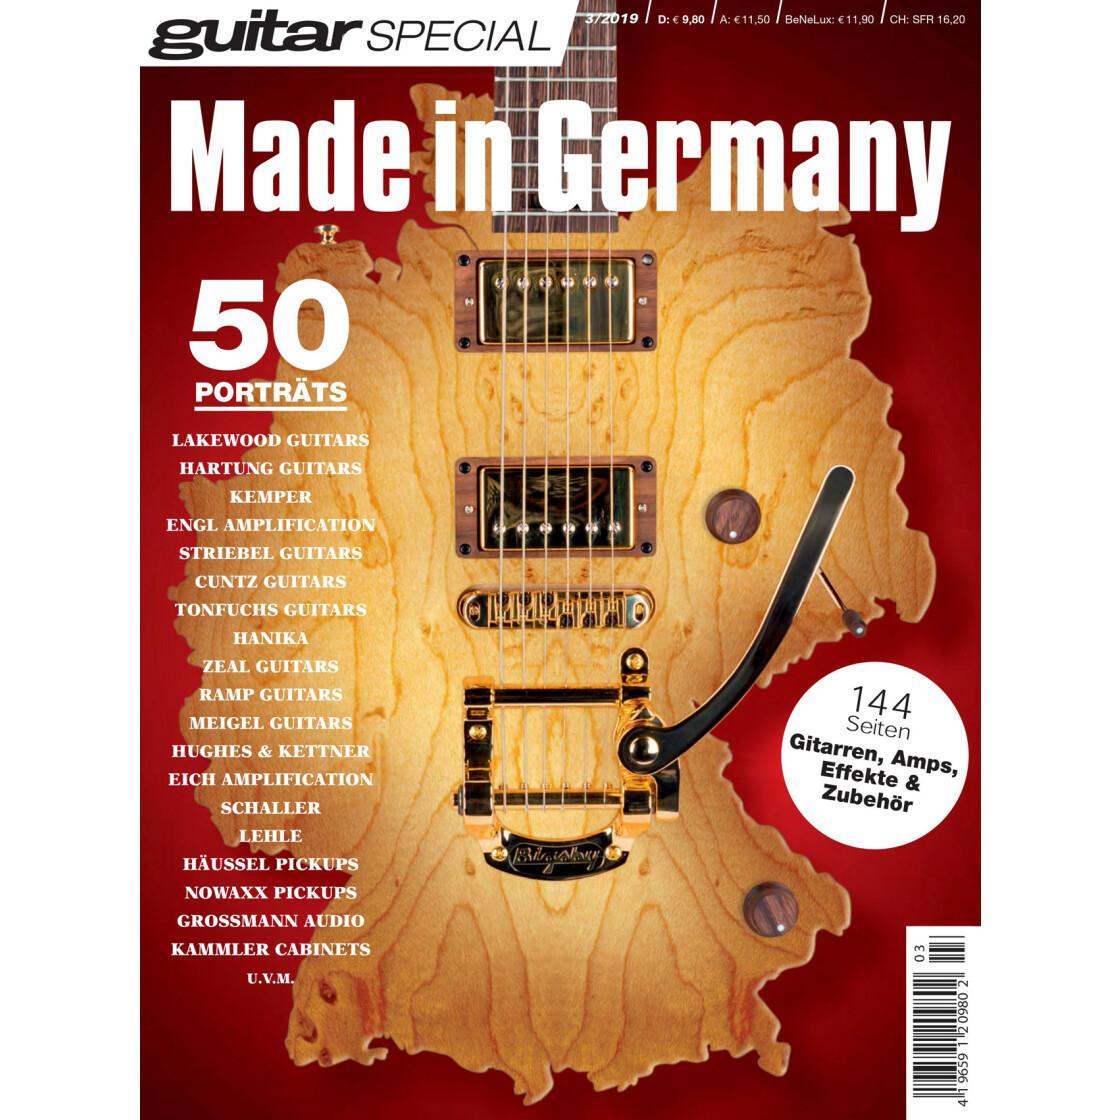 Guitar SPECIAL Magazin